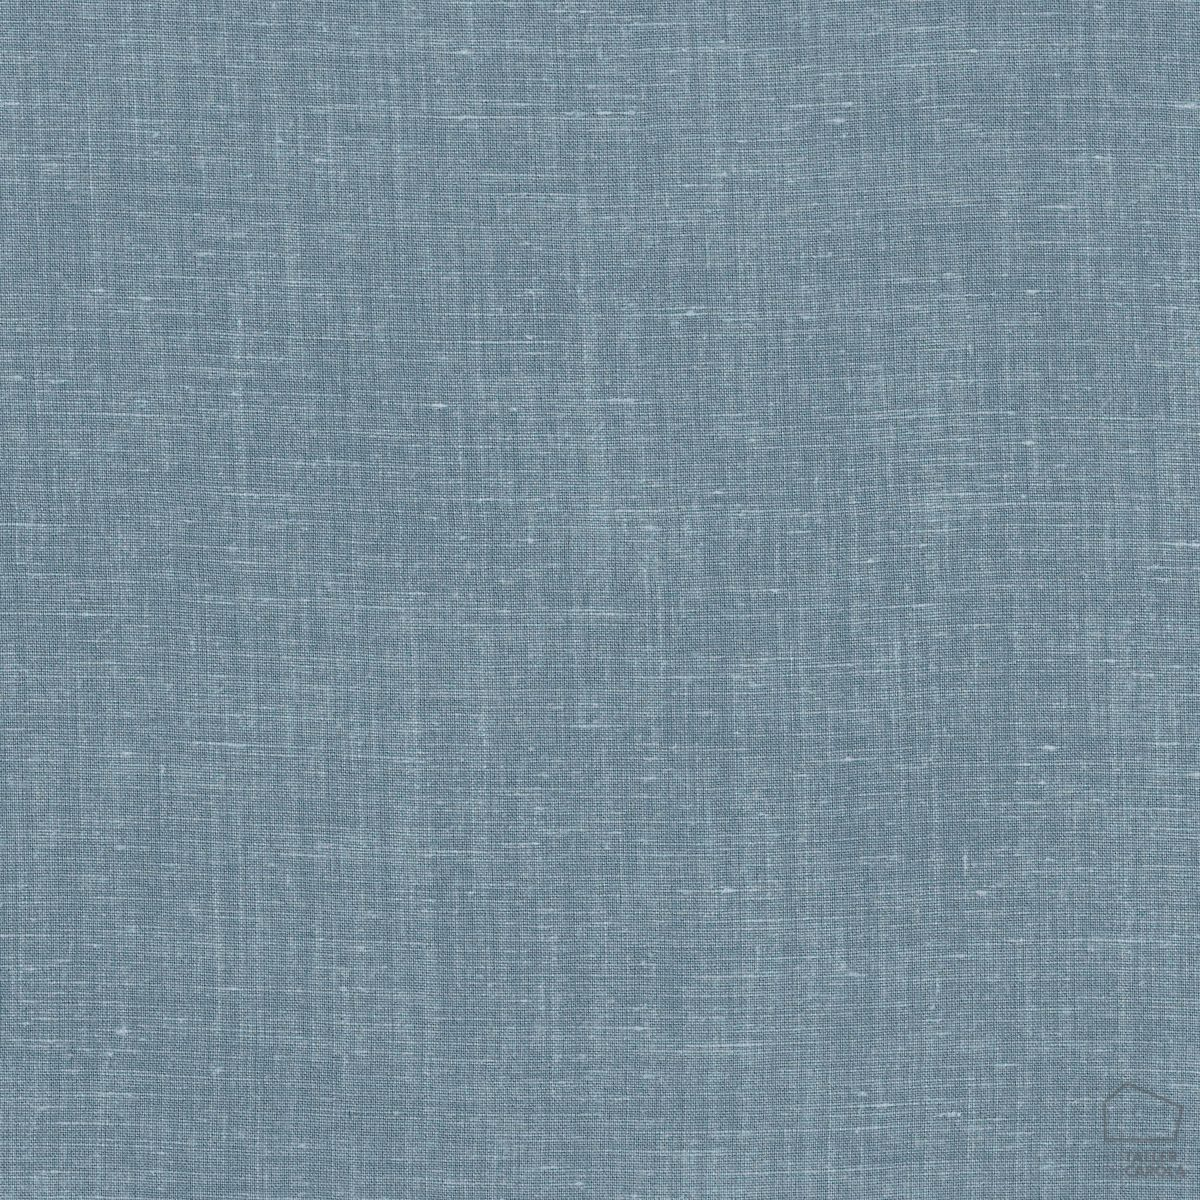 057sul38592700 Tela Lino Liso Empolvado Azul